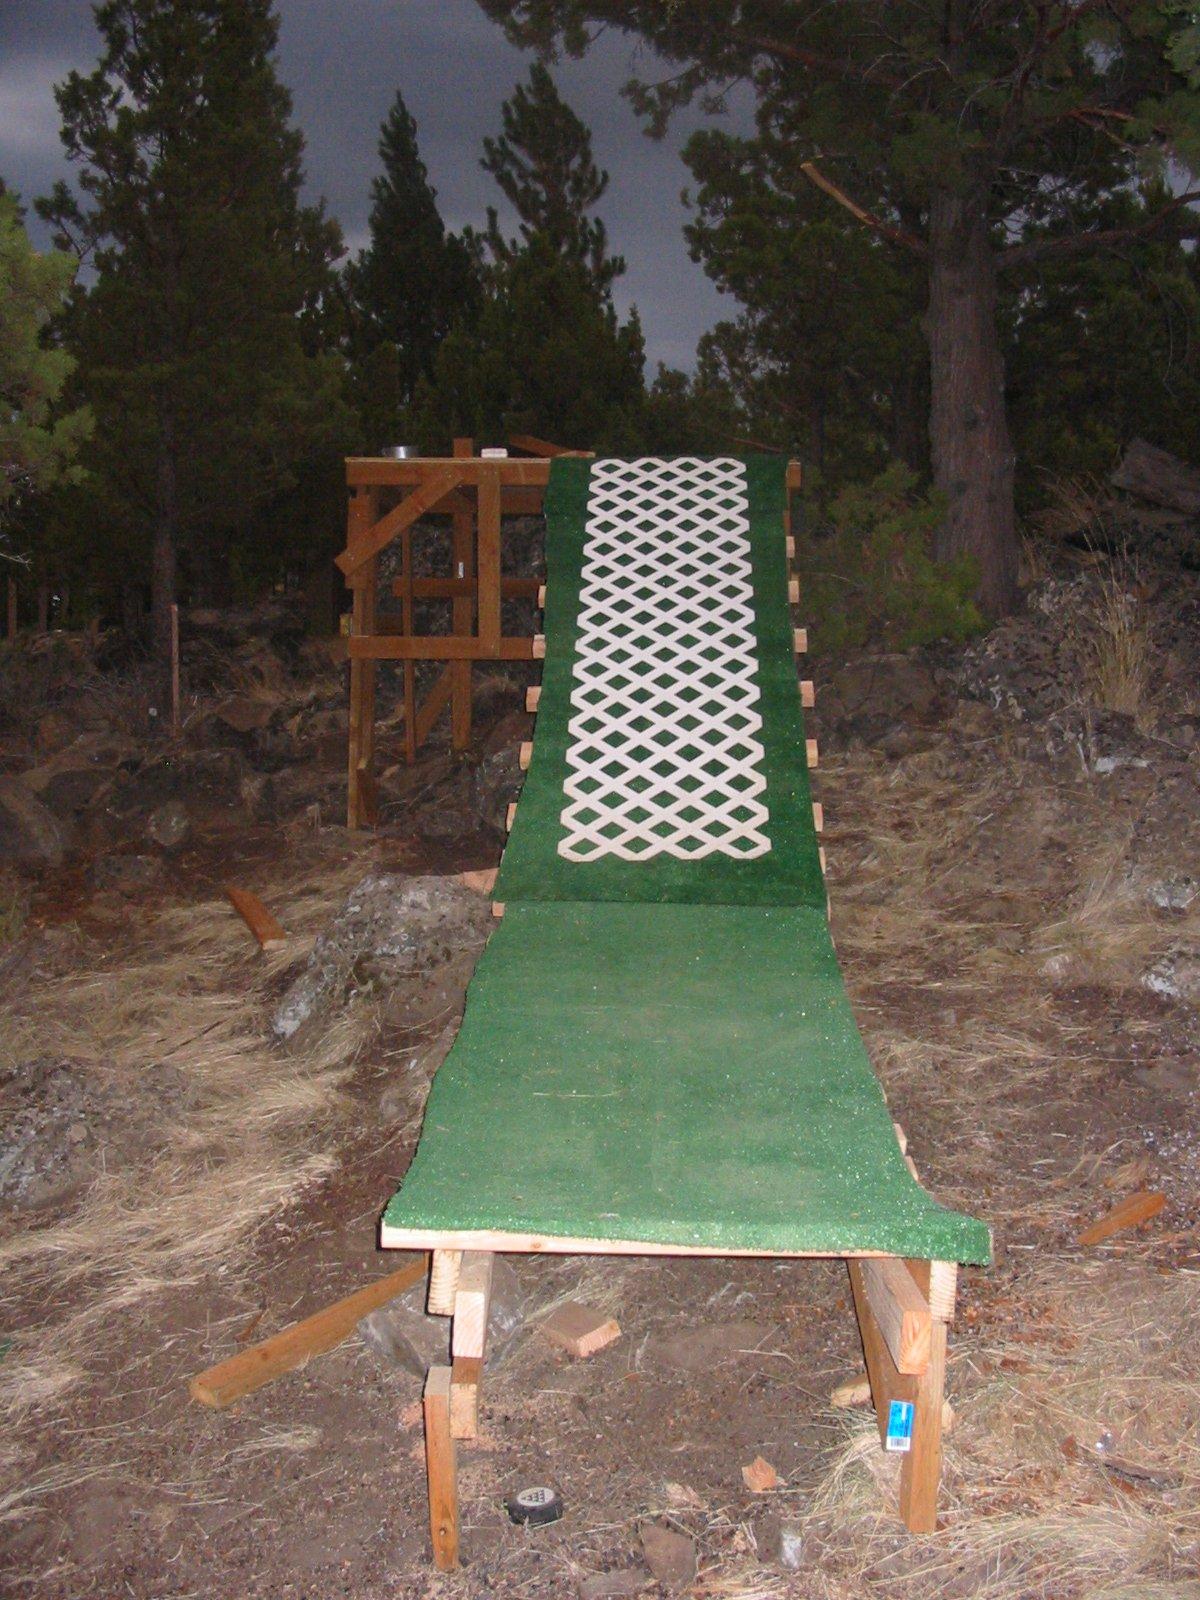 My new summer setup - 3 of 4